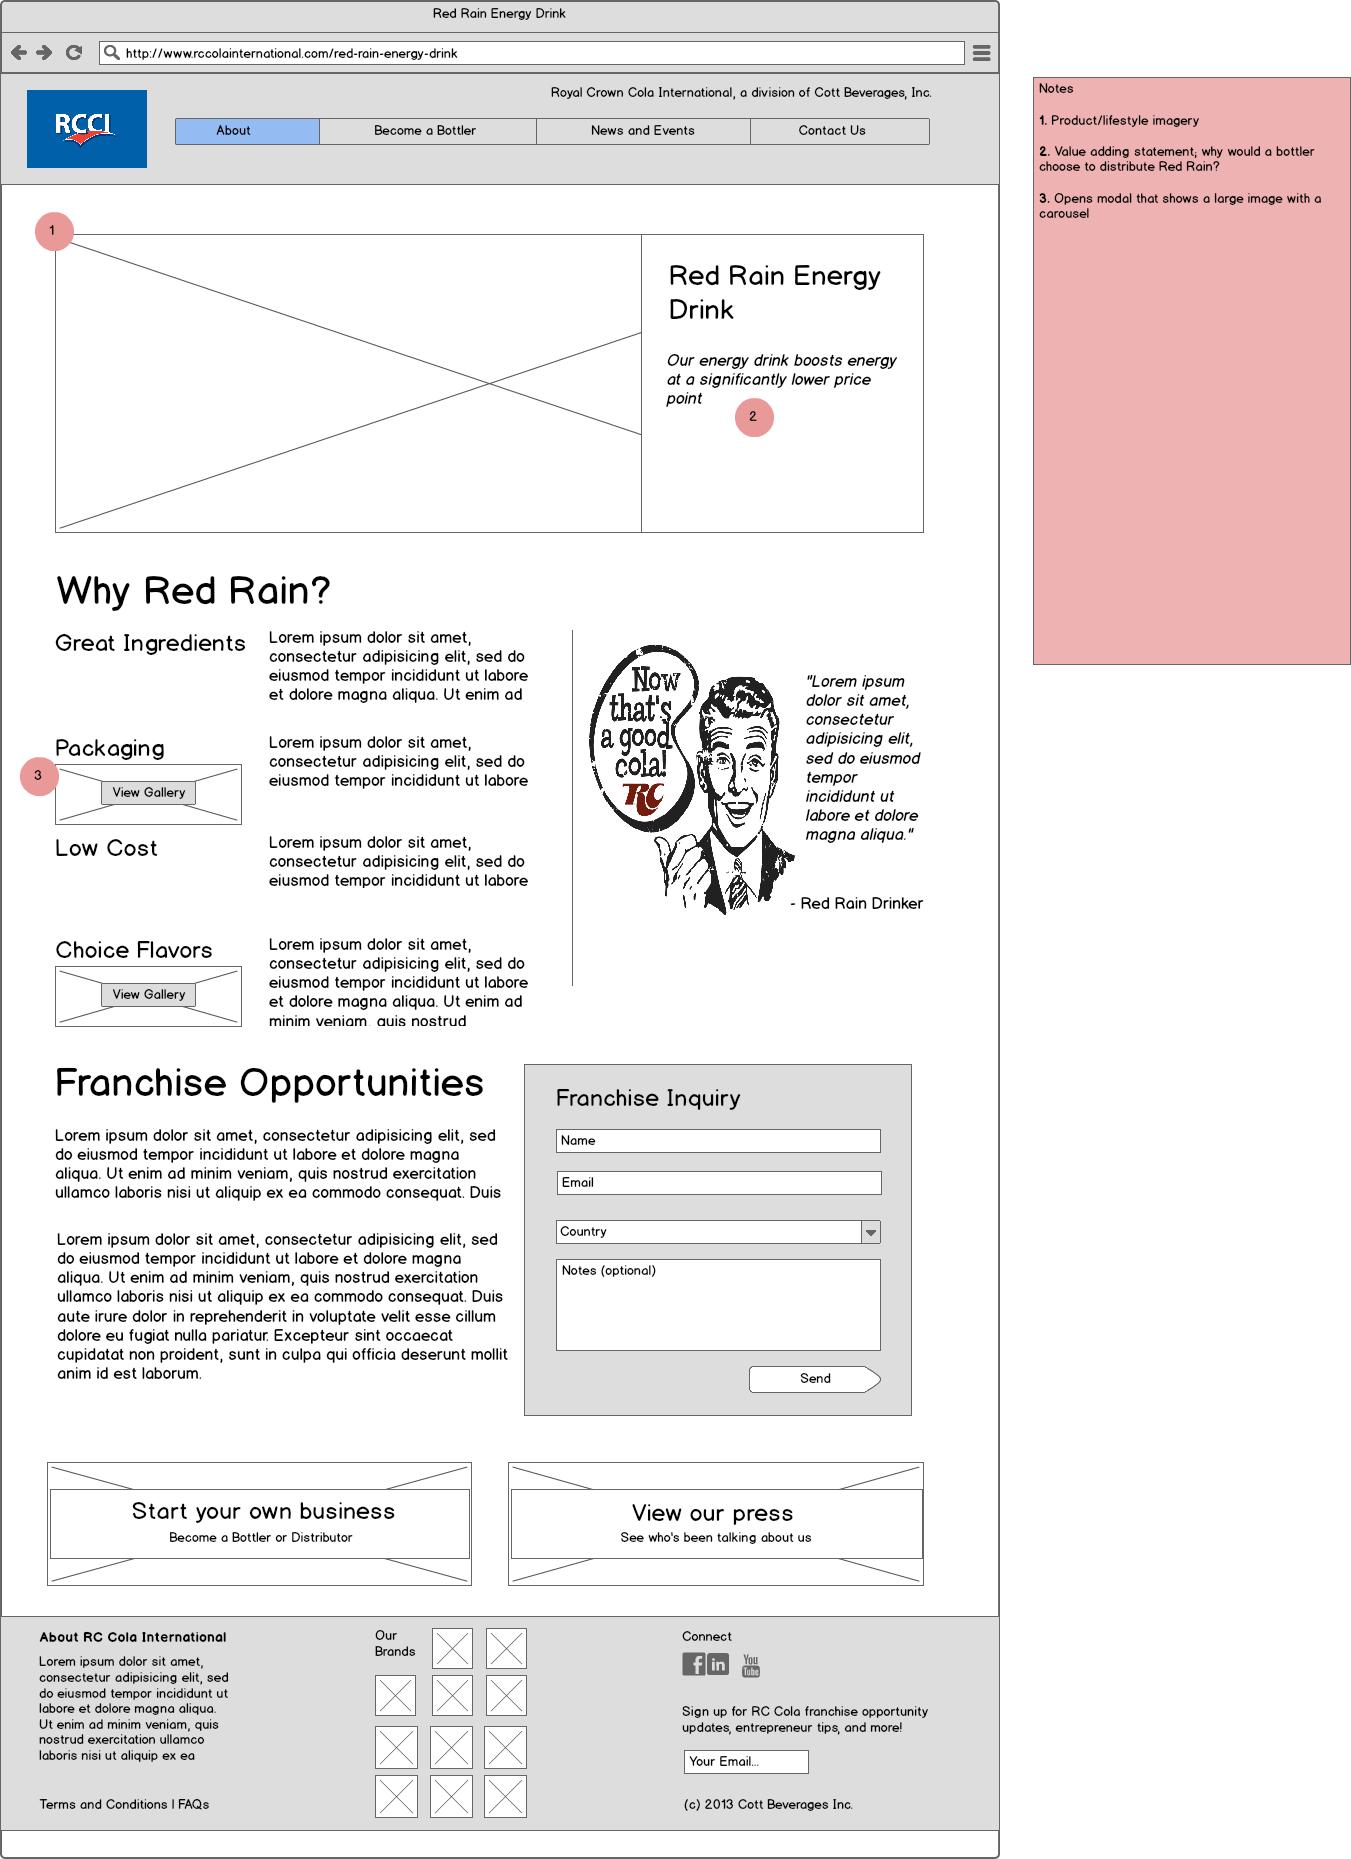 2_2 Brand Landing Page.png